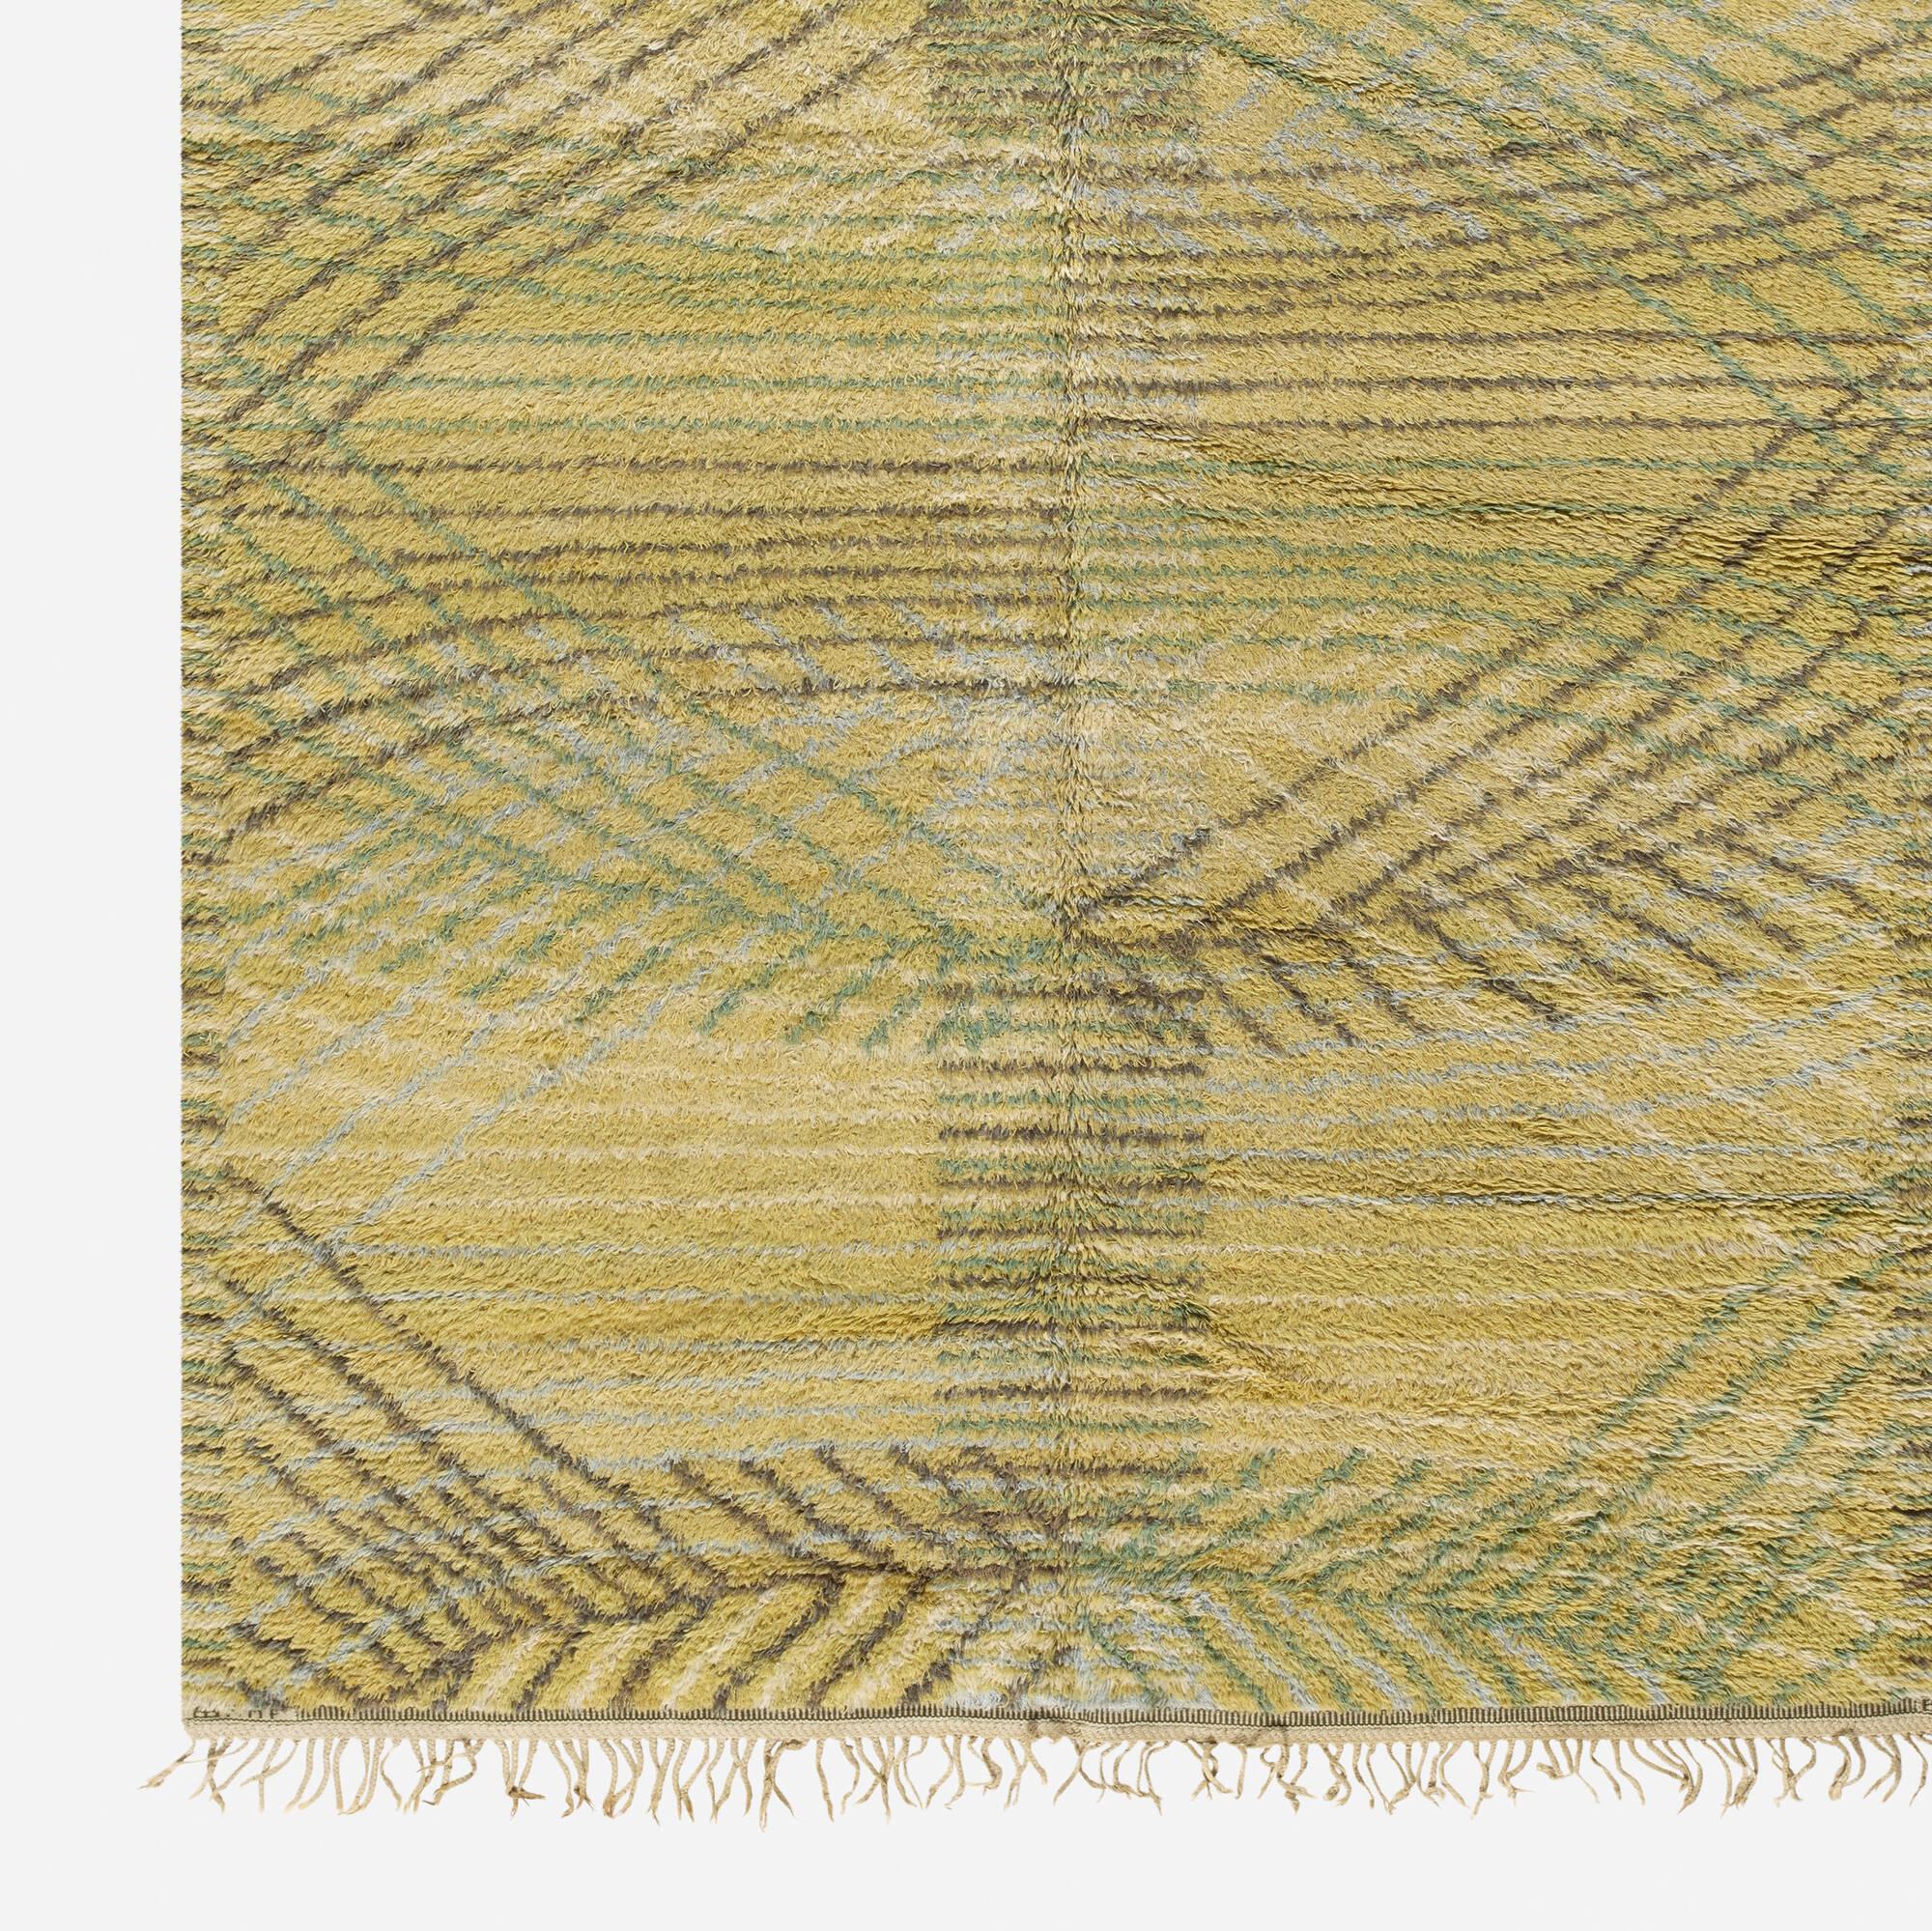 195: Barbro Nilsson / Marina rya carpet (2 of 2)